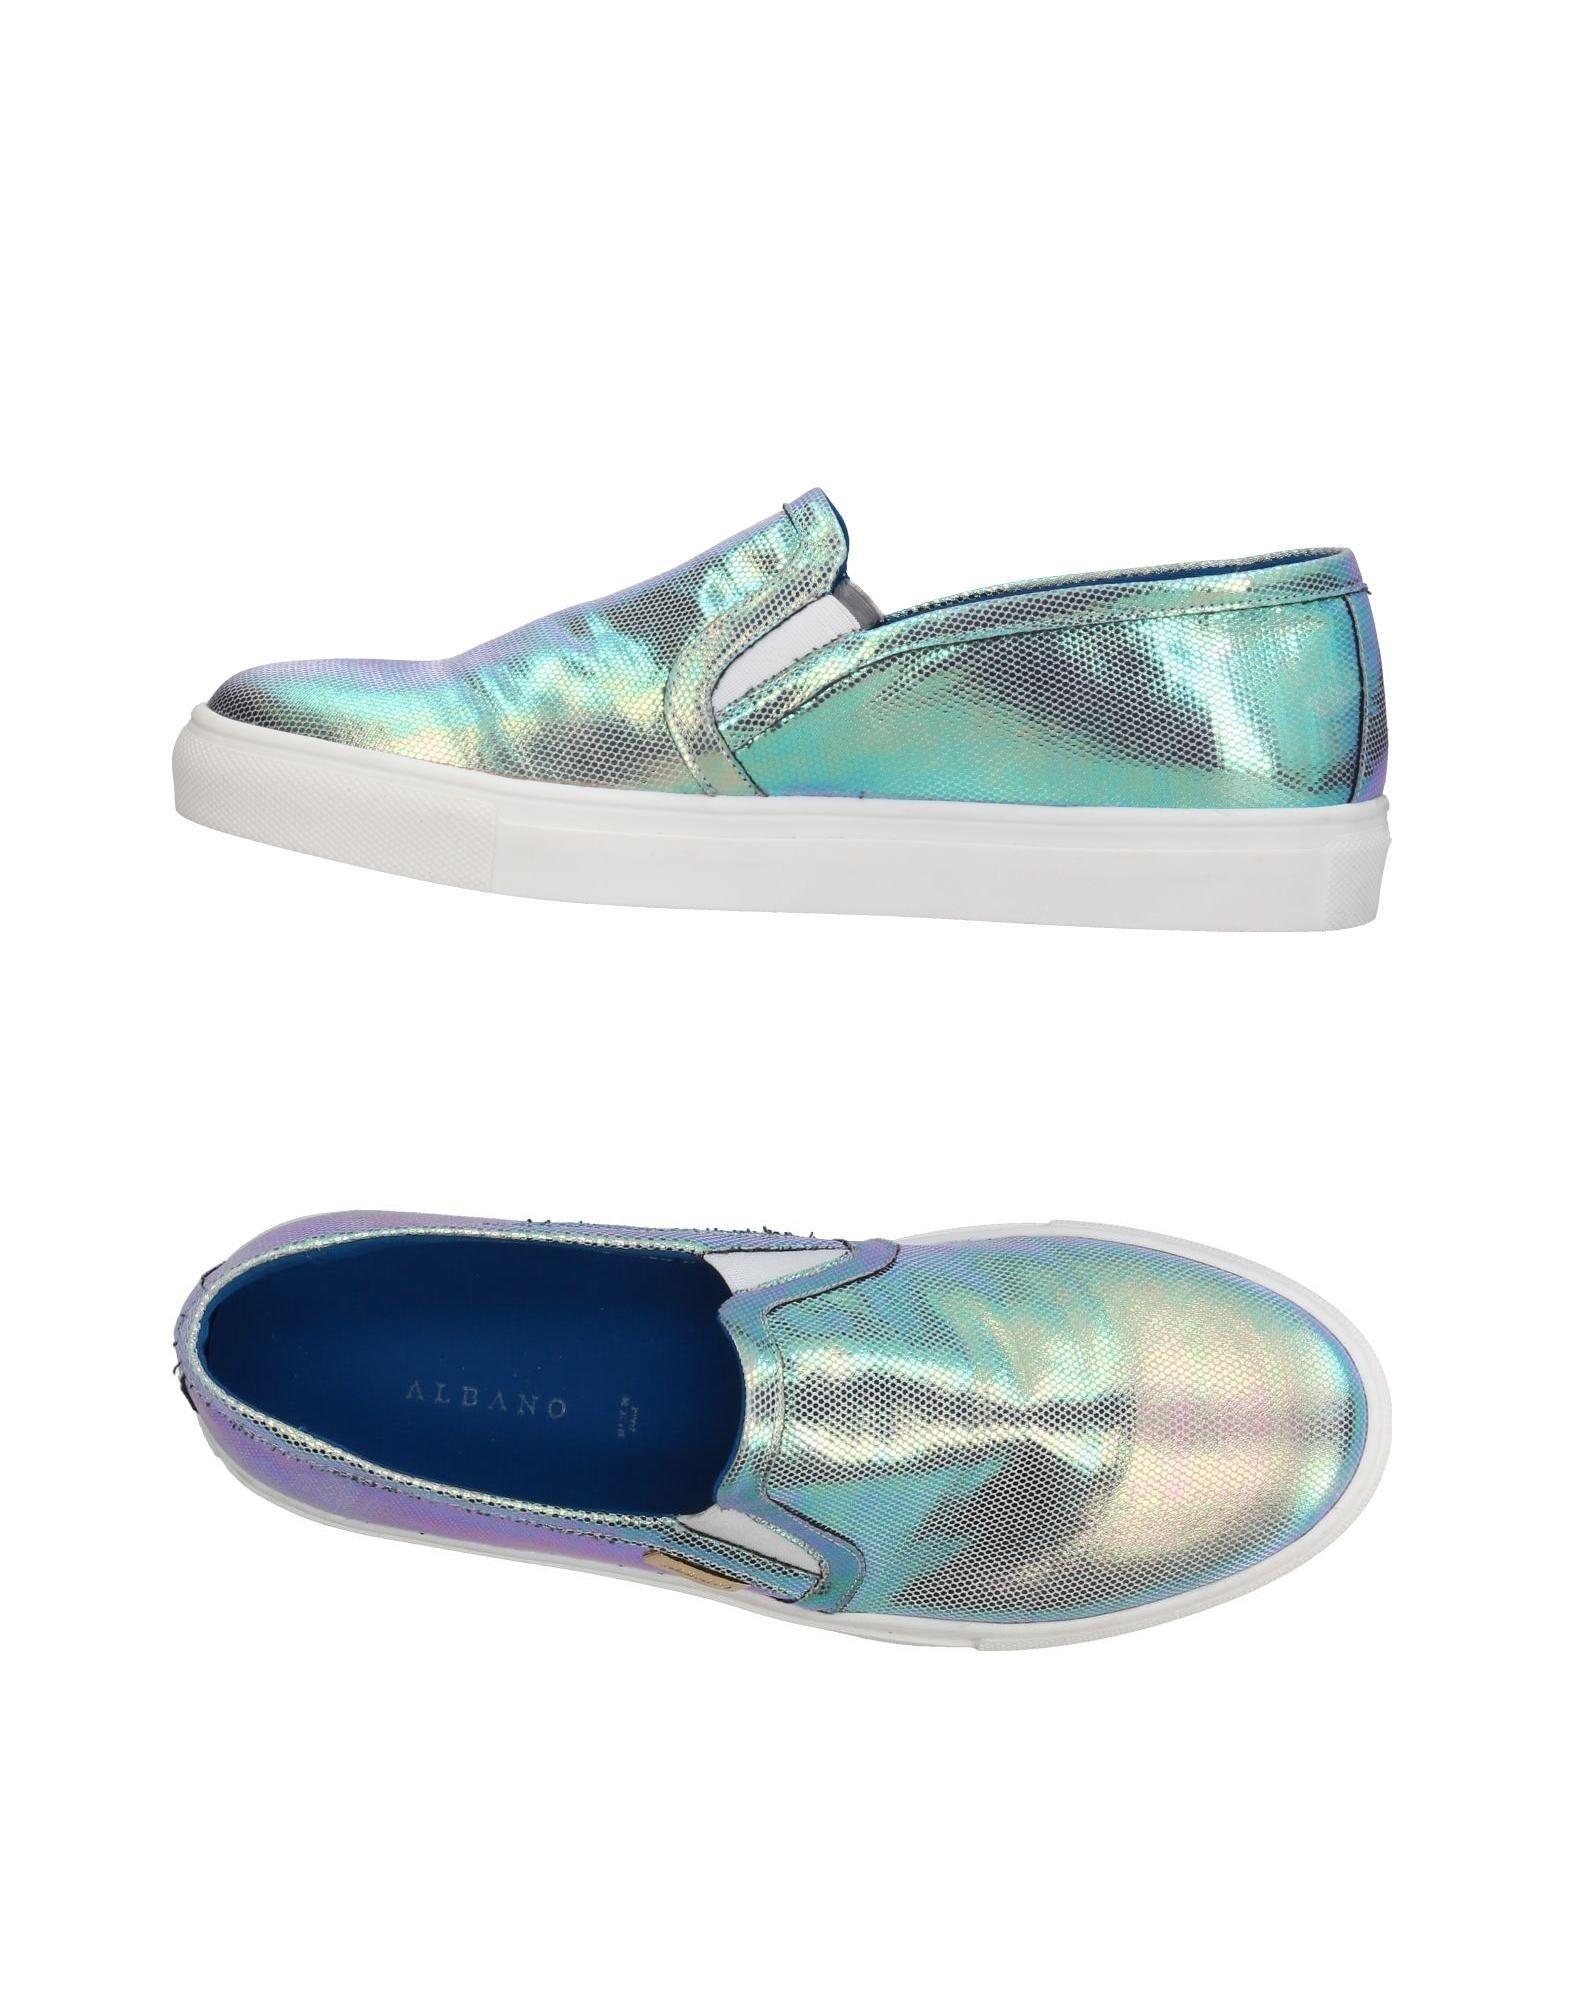 Albano Sneakers Damen  11369455IT Gute Qualität beliebte Schuhe